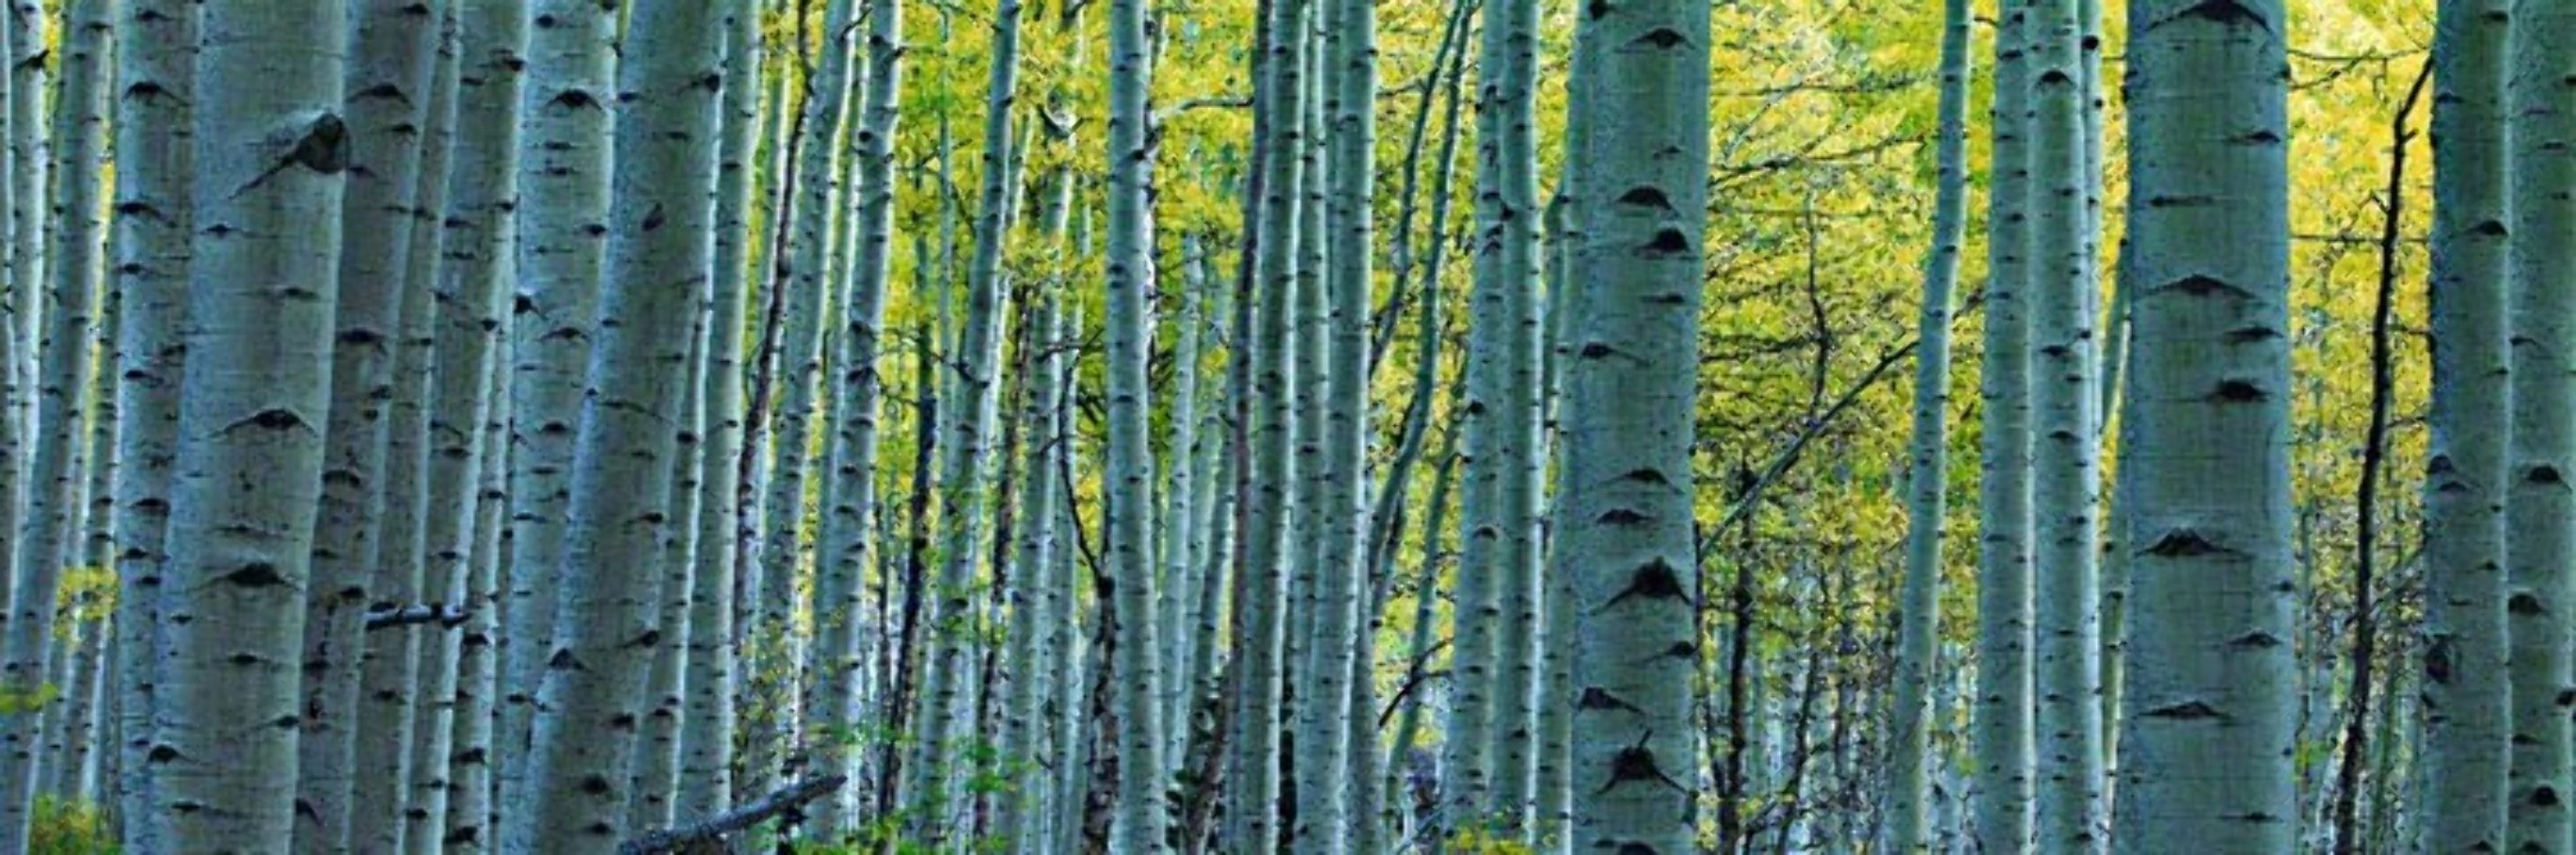 Endless Birches Colorado AP 2M Huge Panorama by Peter Lik